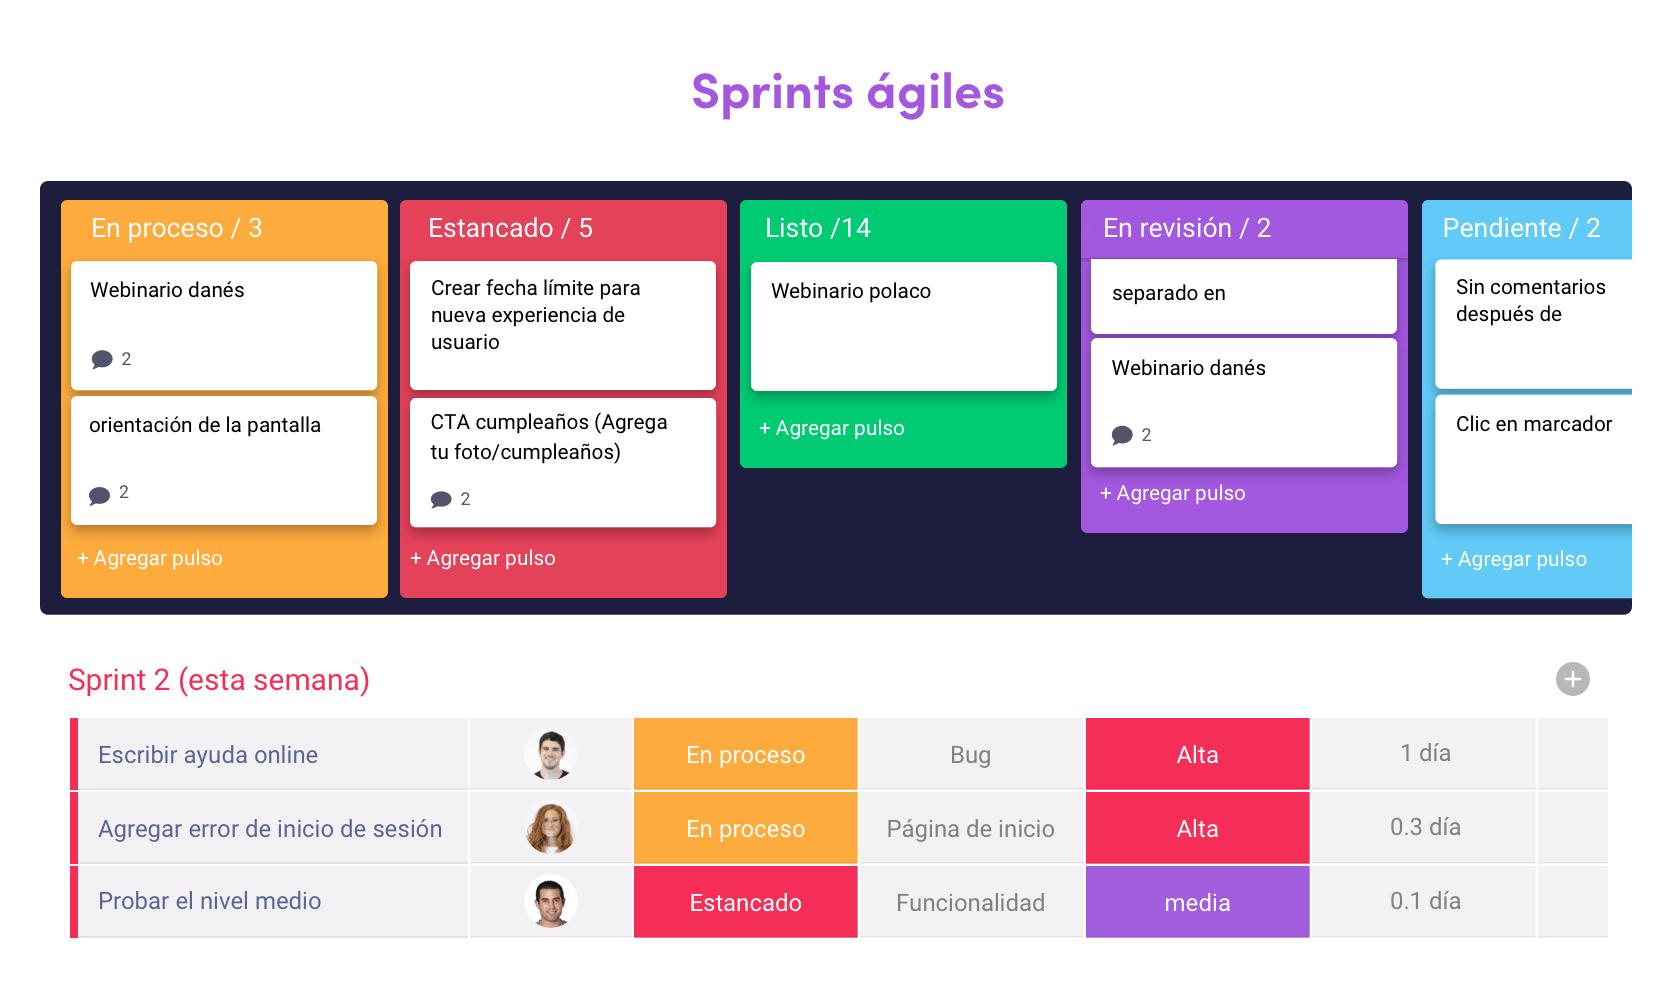 77f9d137-4399-49db-ab34-01295f0a5933_AgileSprints-spanish.png